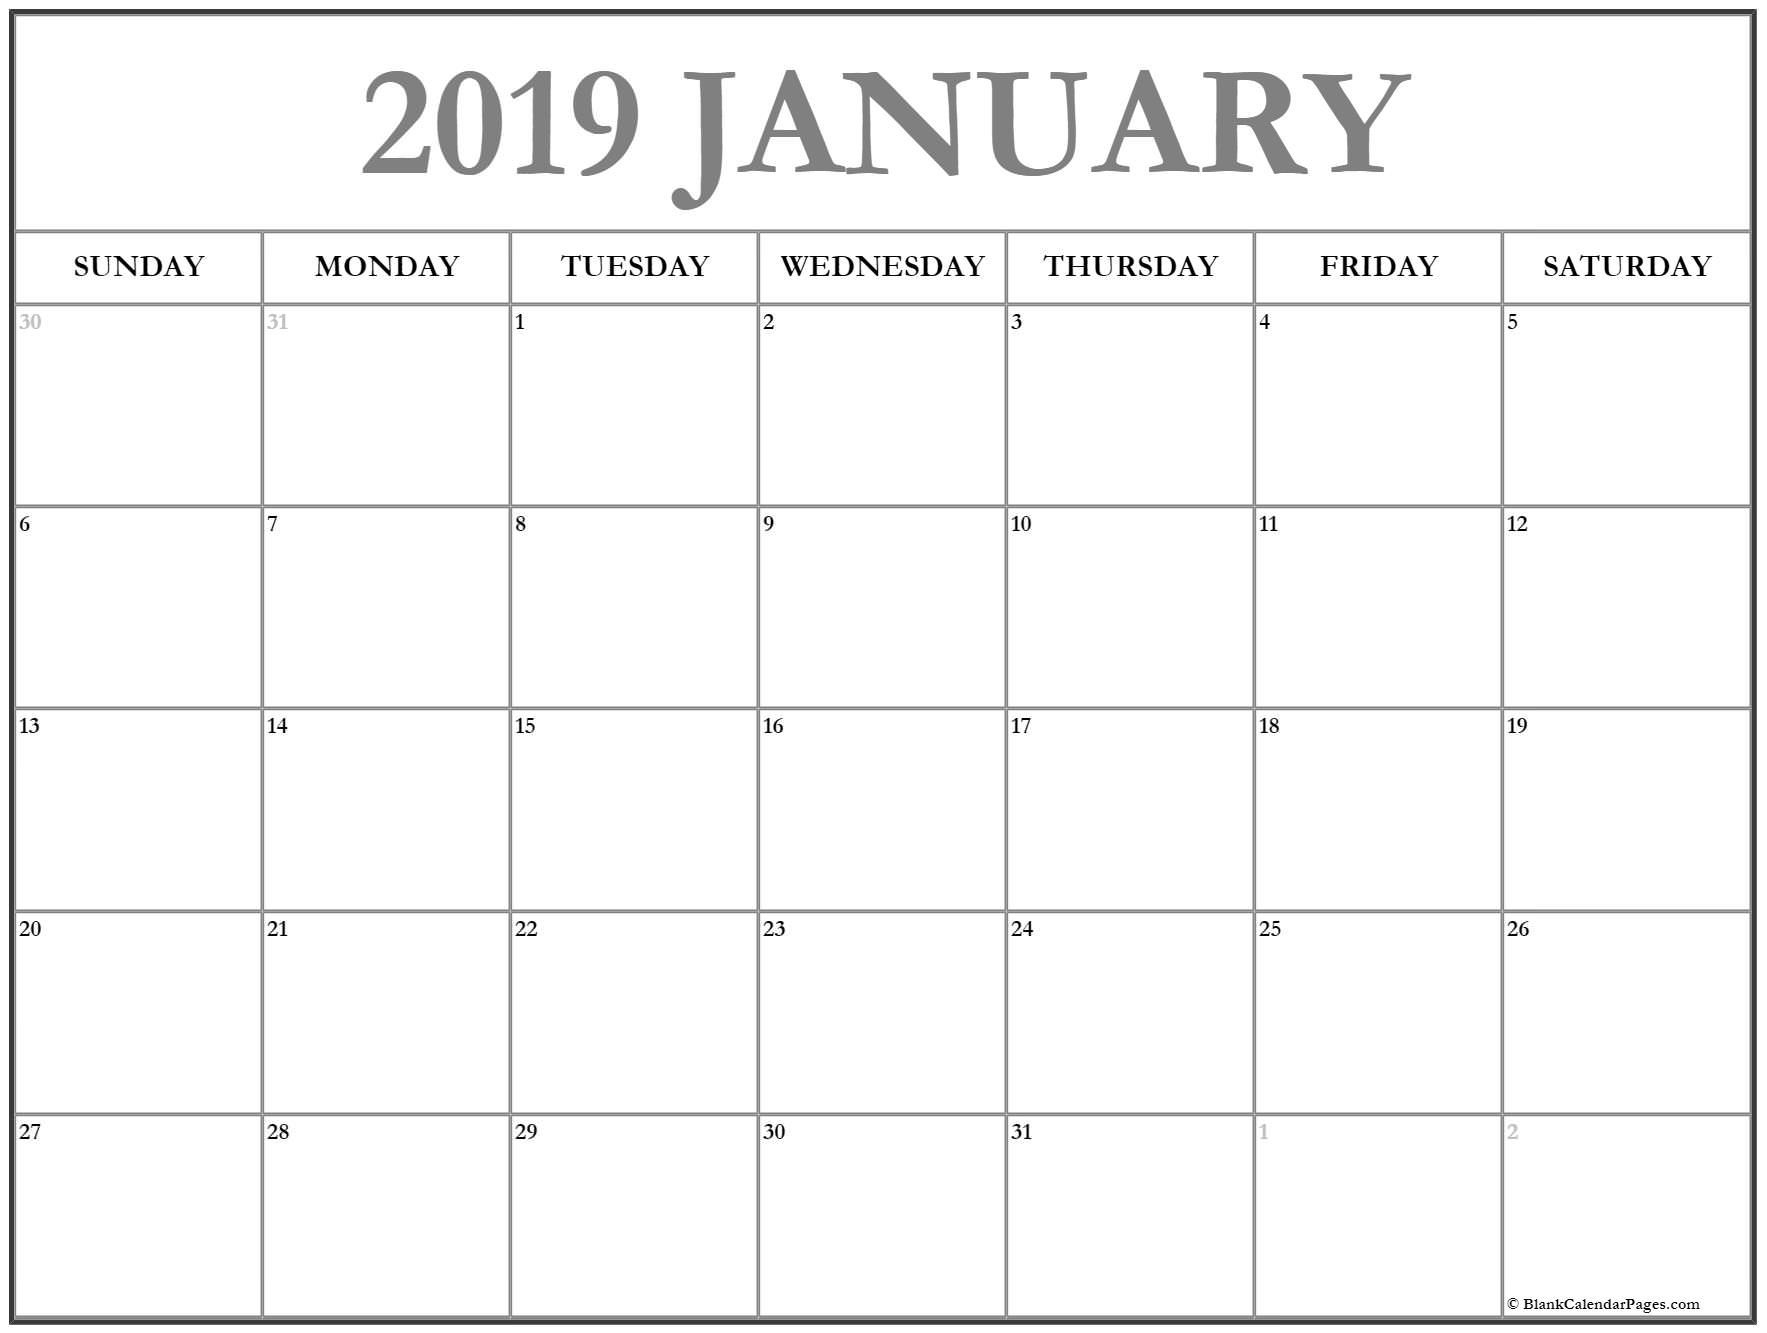 January 2019 Calendar January Calendar 2019 Printable And Free